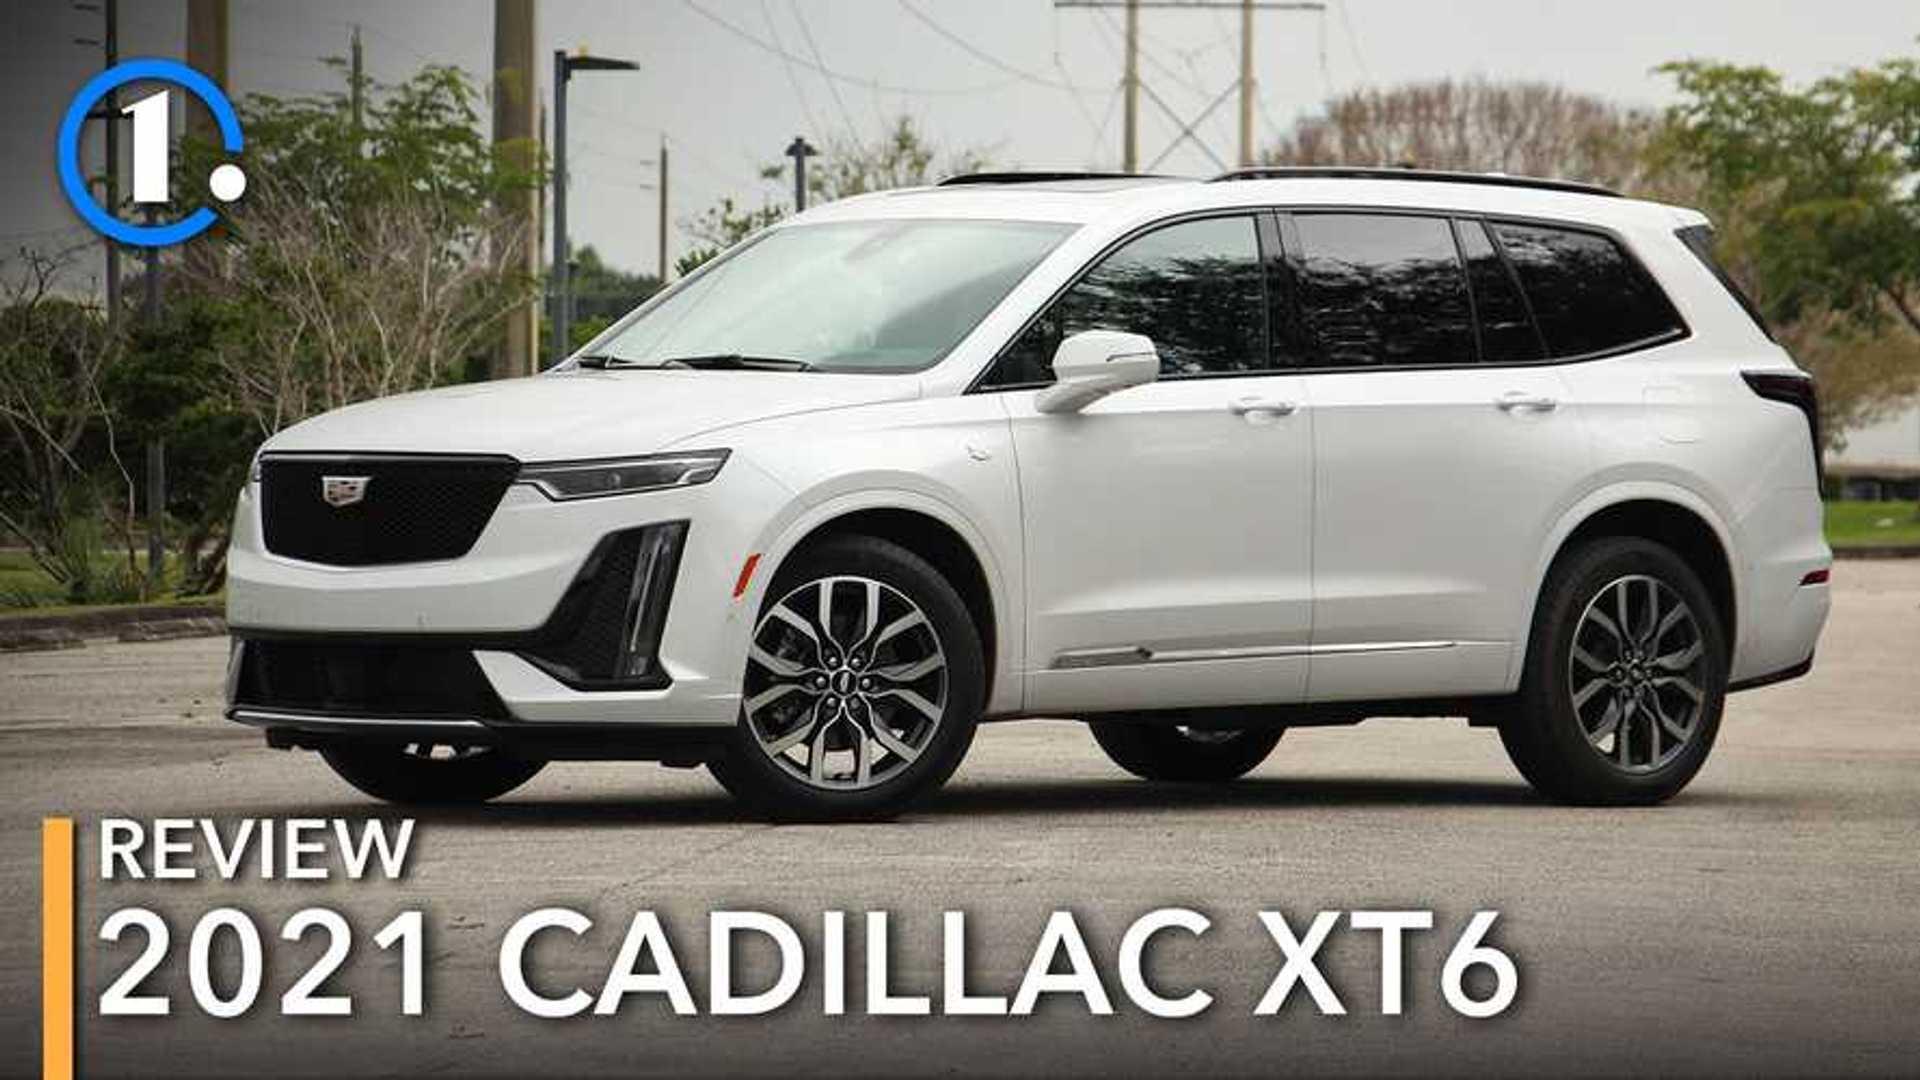 2021 Cadillac XT6 Sport Review: Just Not Good Enough